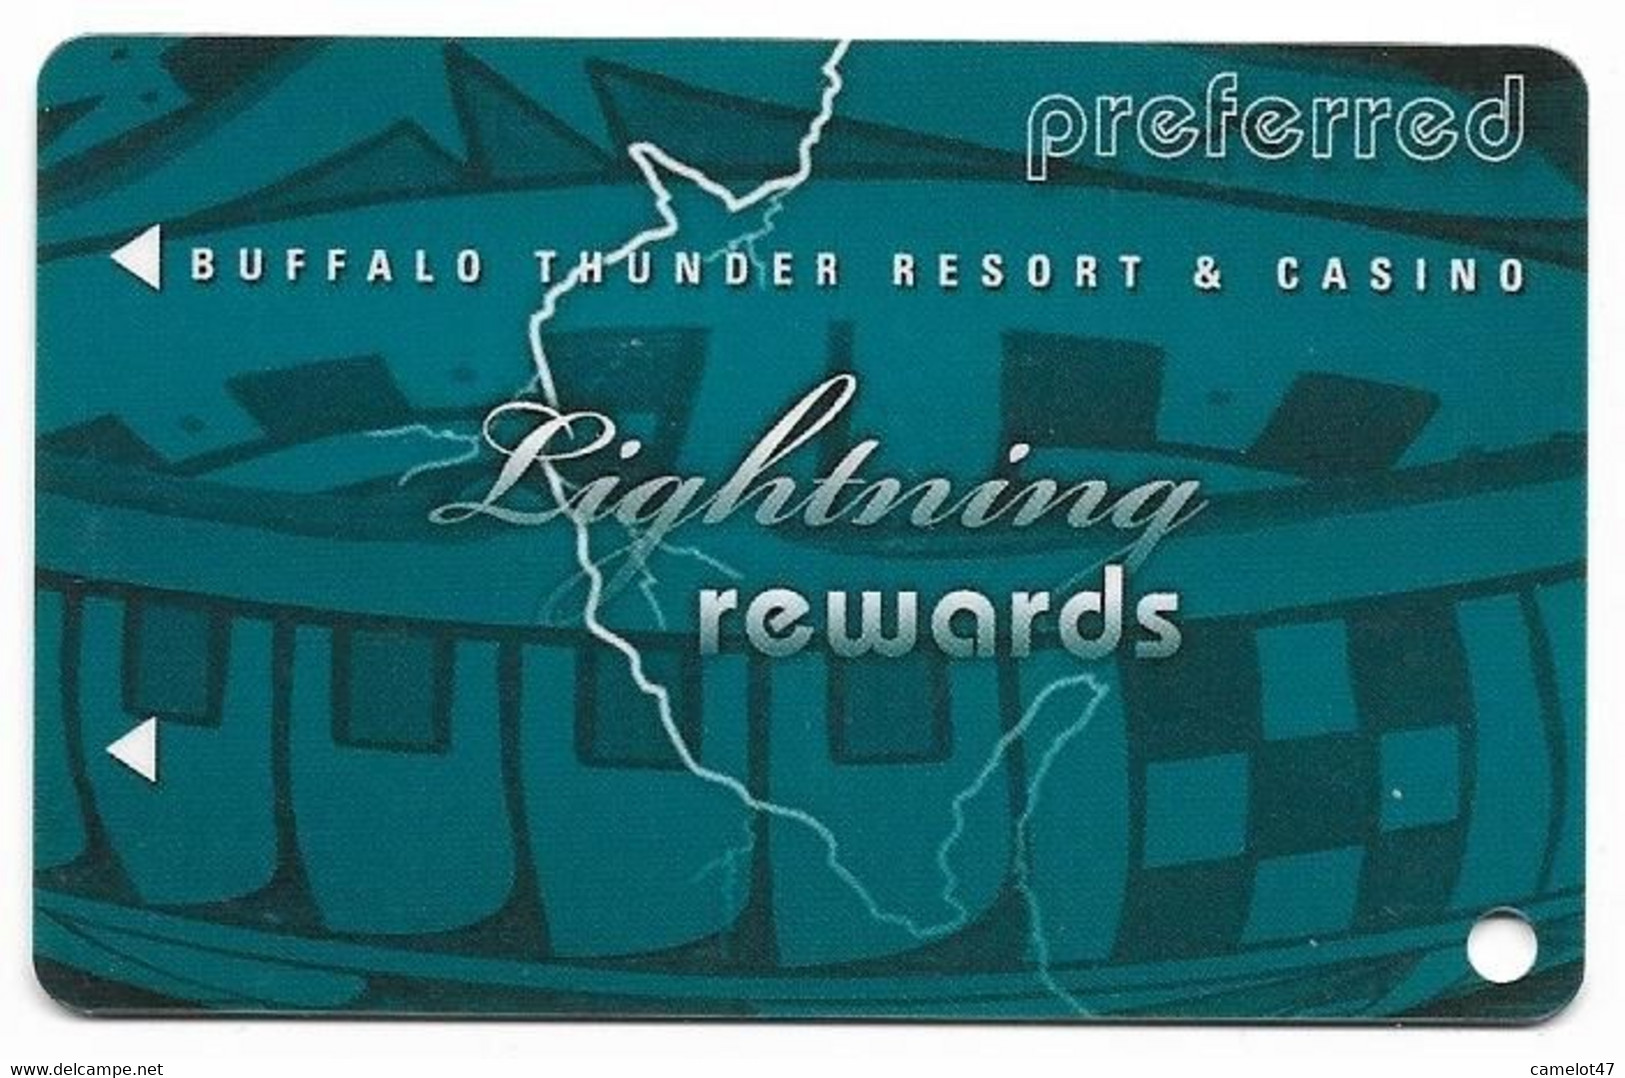 Buffalo Thunder Resort & Casino, Santa Fe, NM,  U.S.A., Older Used BLANK Slot Or Player's Card, # Buffalothunder-1blank - Casino Cards